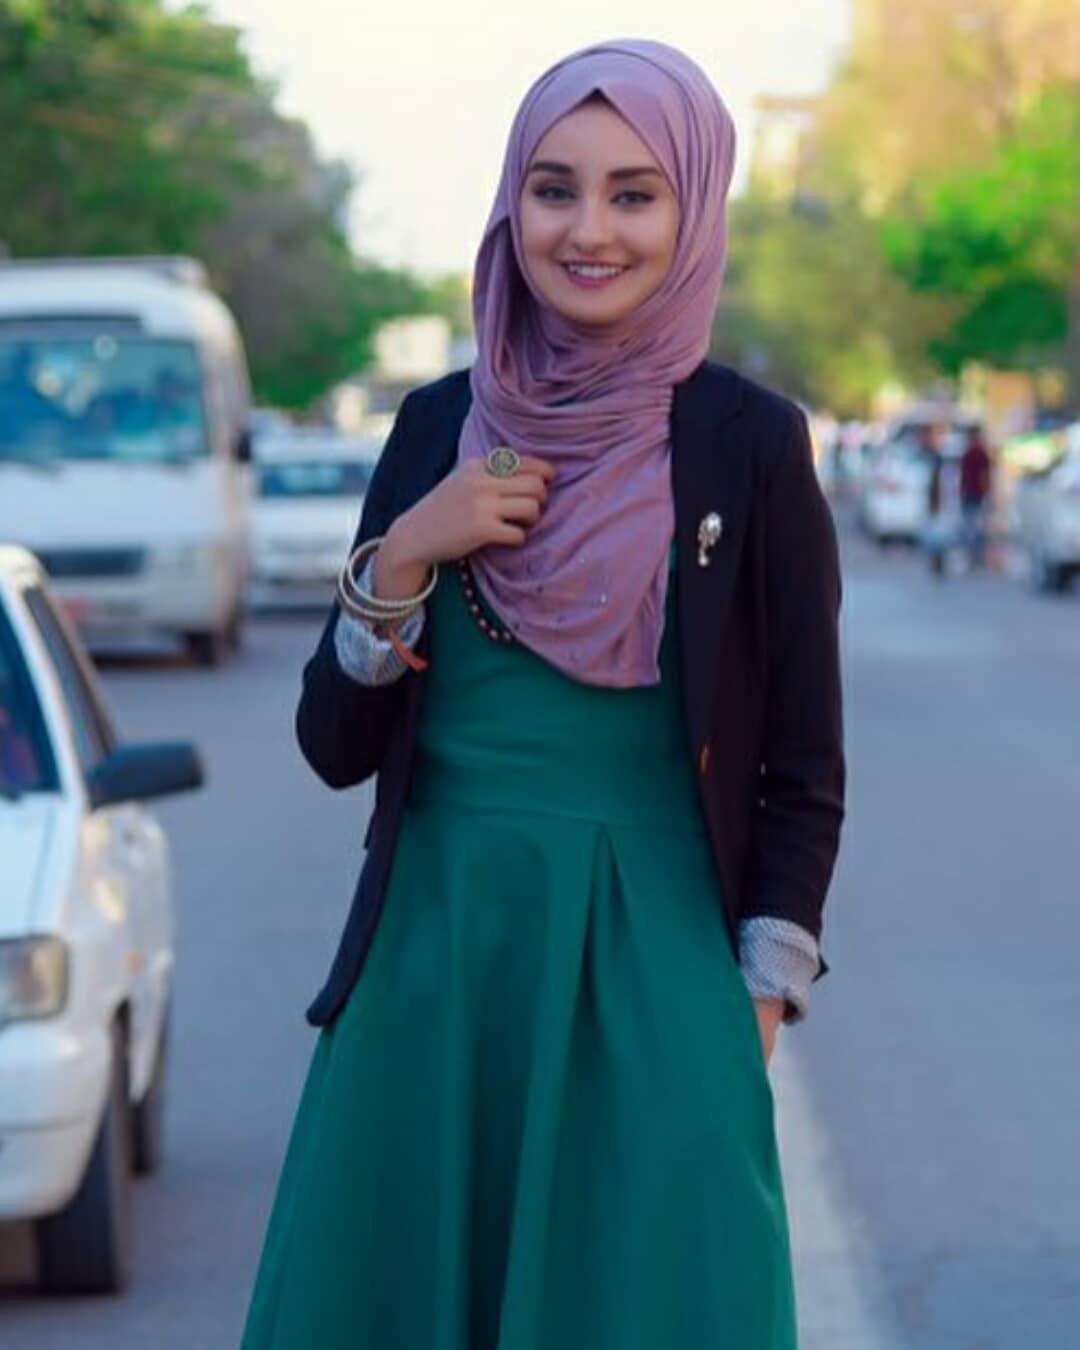 بالصور صور عن الحجاب , بنات محجبات حجابي وقاري 6218 8